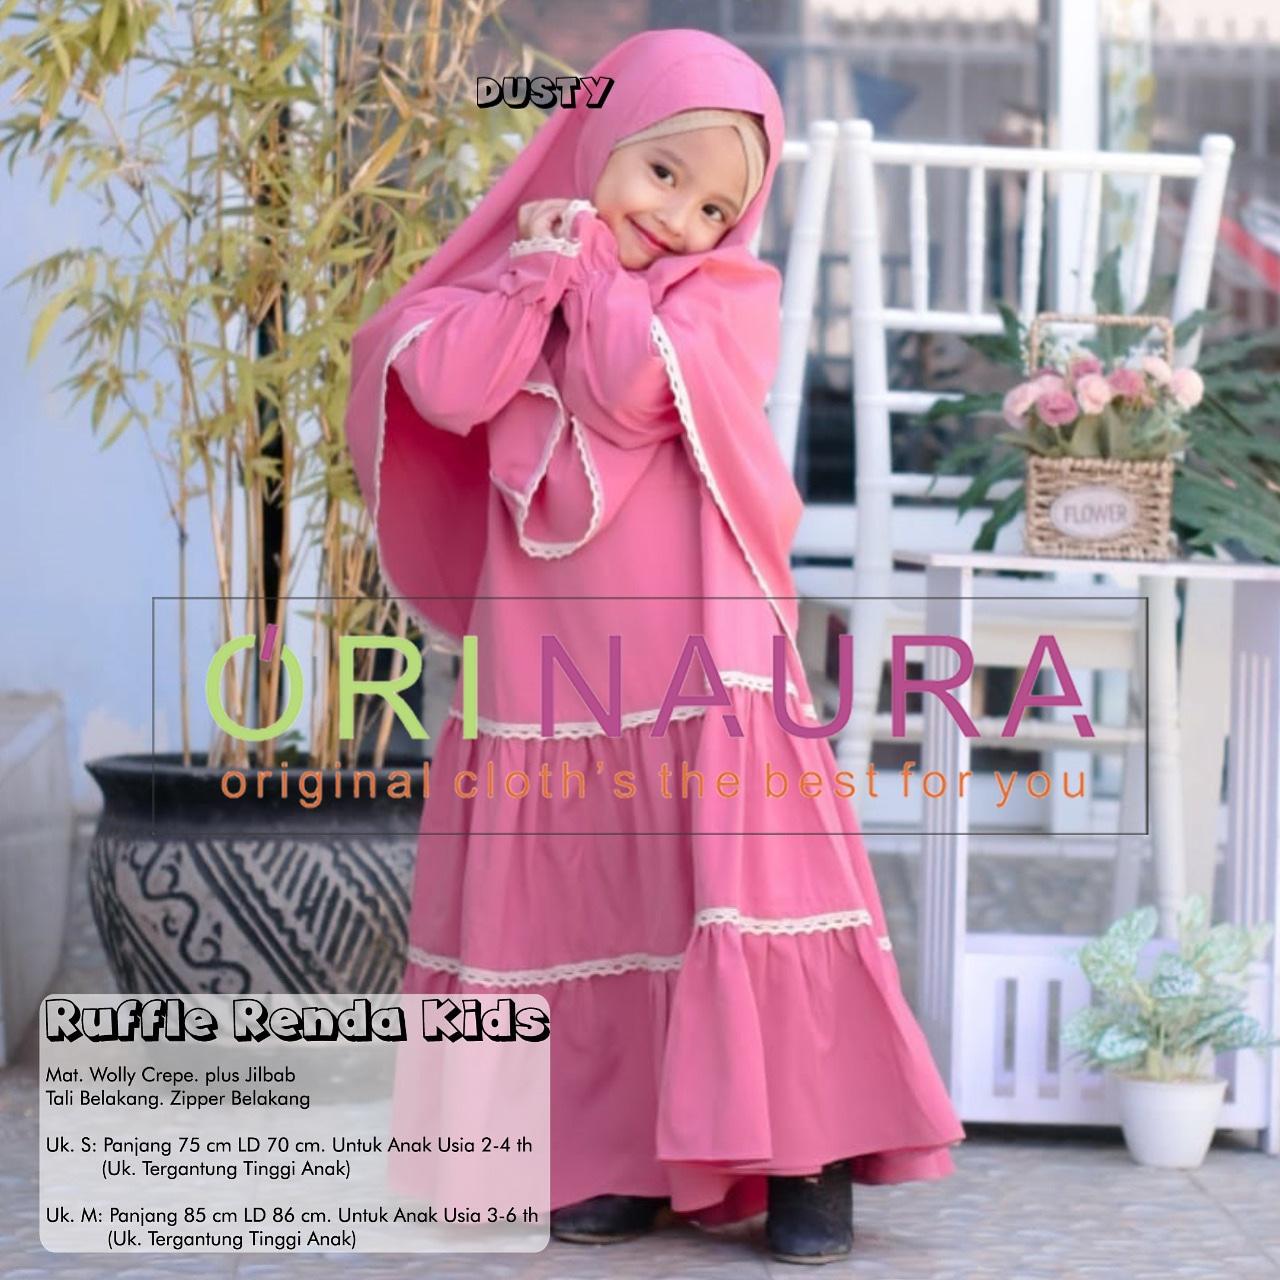 Rufle Renda Kids Usia 11 - 11 Tahun Baju Muslim Anak Perempuan Terbaru Baju  Anak Perempuan Umur 11 Tahun Baju Anak Kecil  Pola Dress Anak  Baju